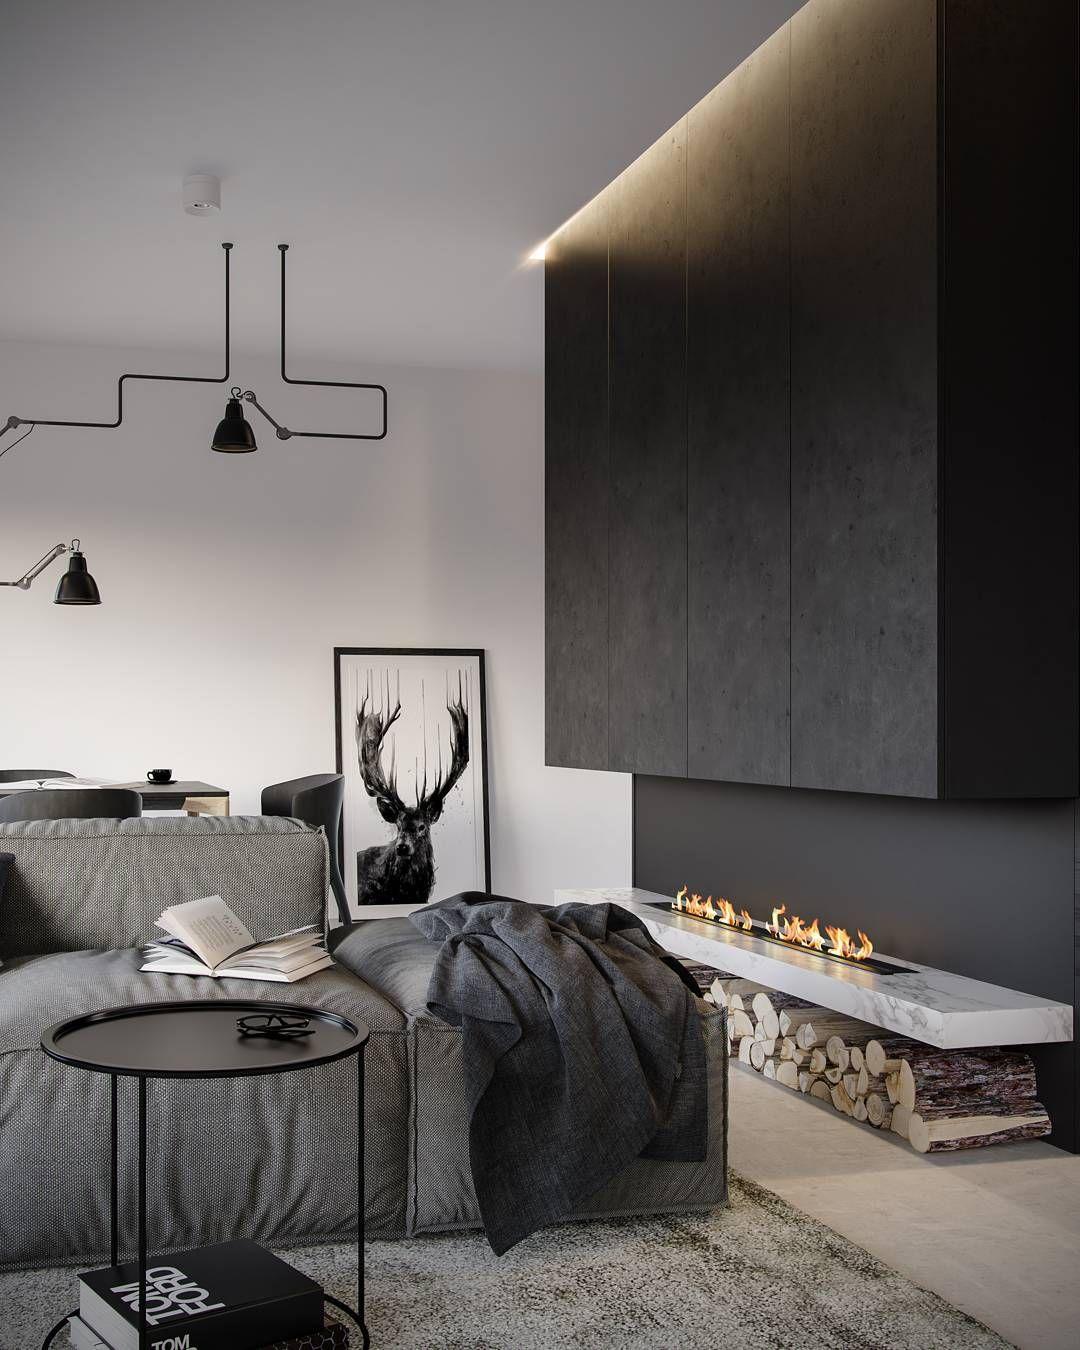 Anna Potapenko _ Rendering VRay 3DSMax | modern interior design